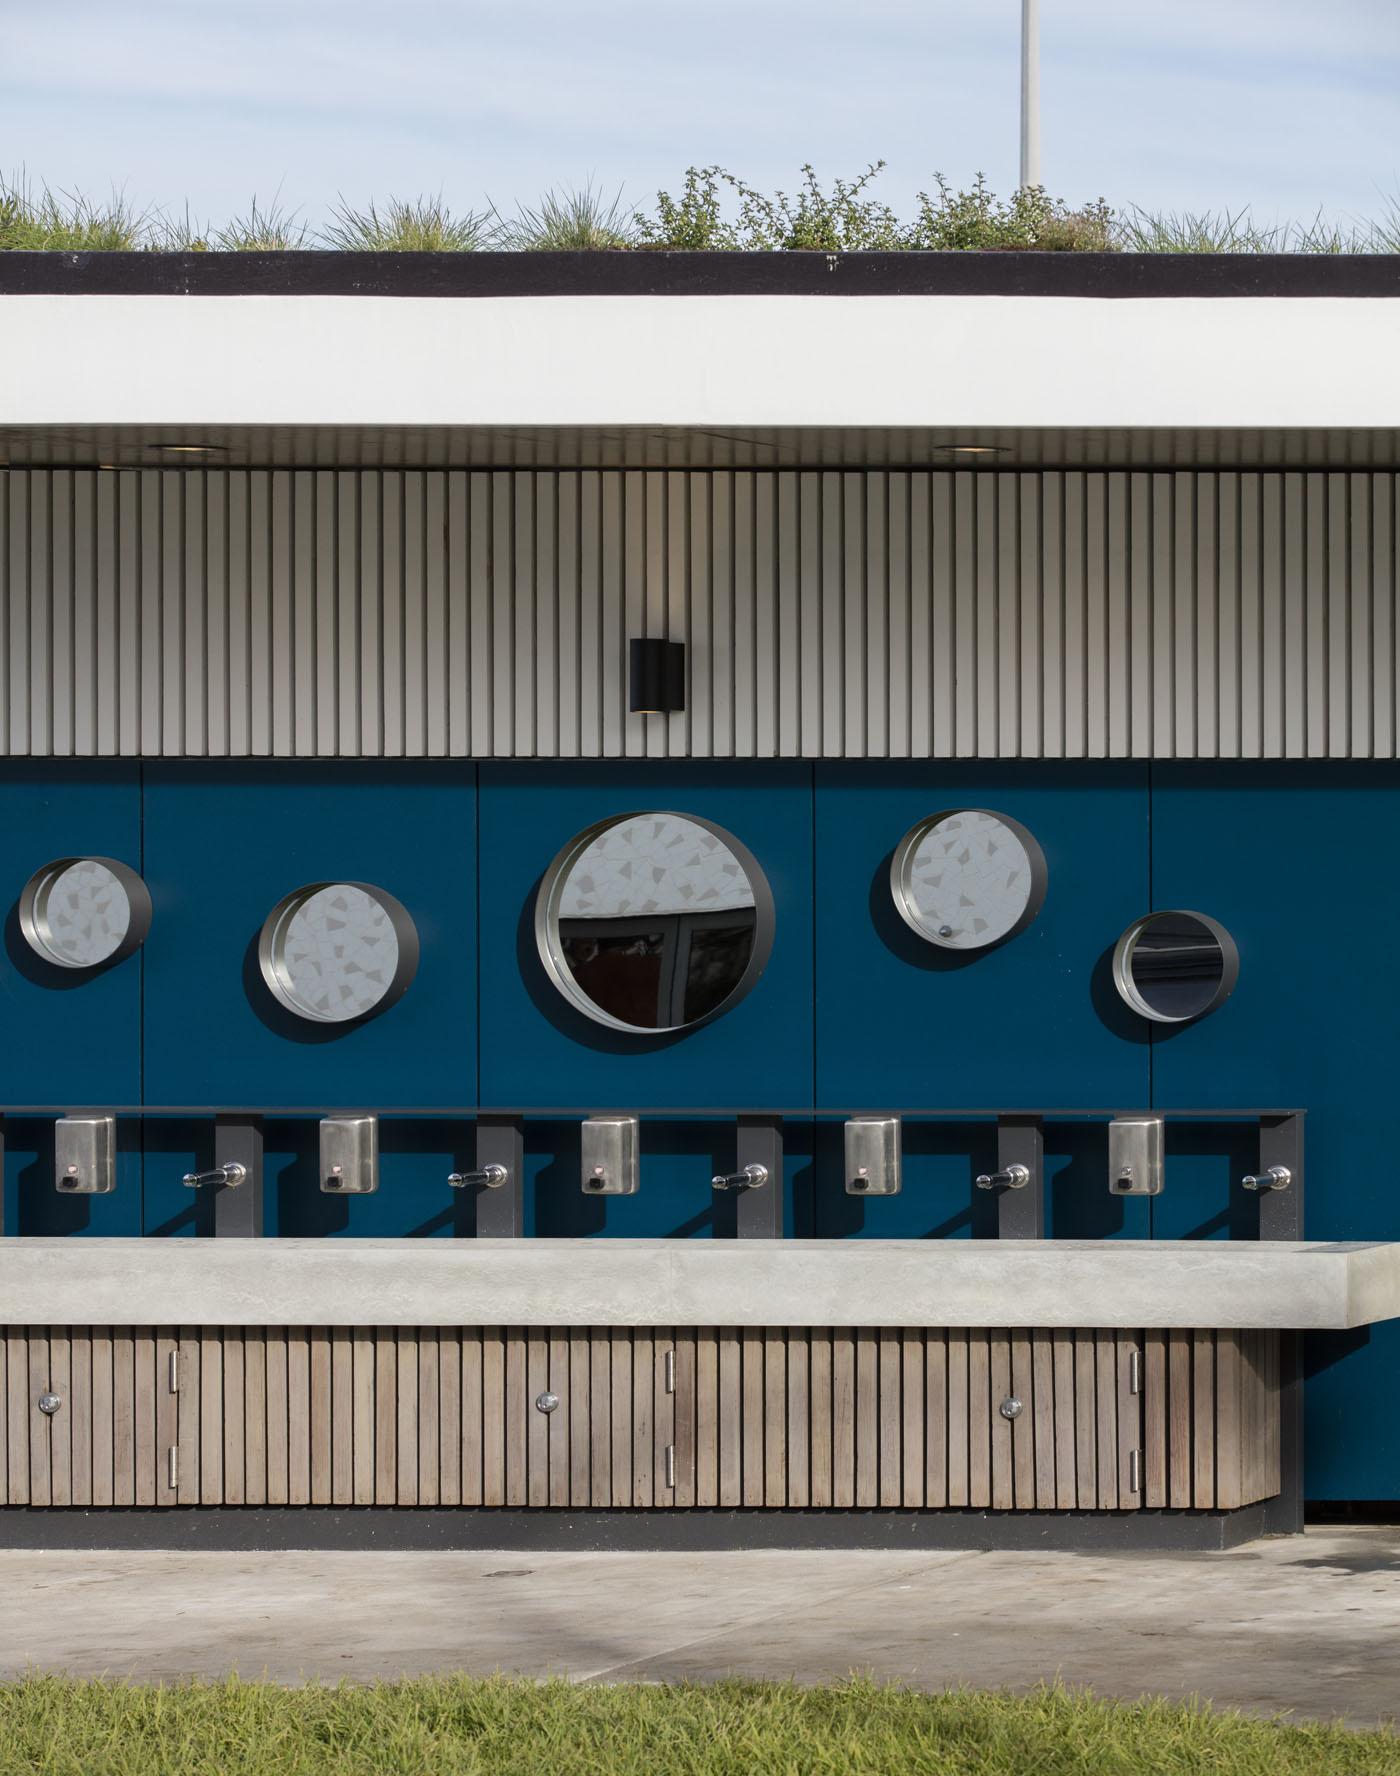 North Bondi Amenities, a public project by award winning Sam Crawford Architects. Elevation view.